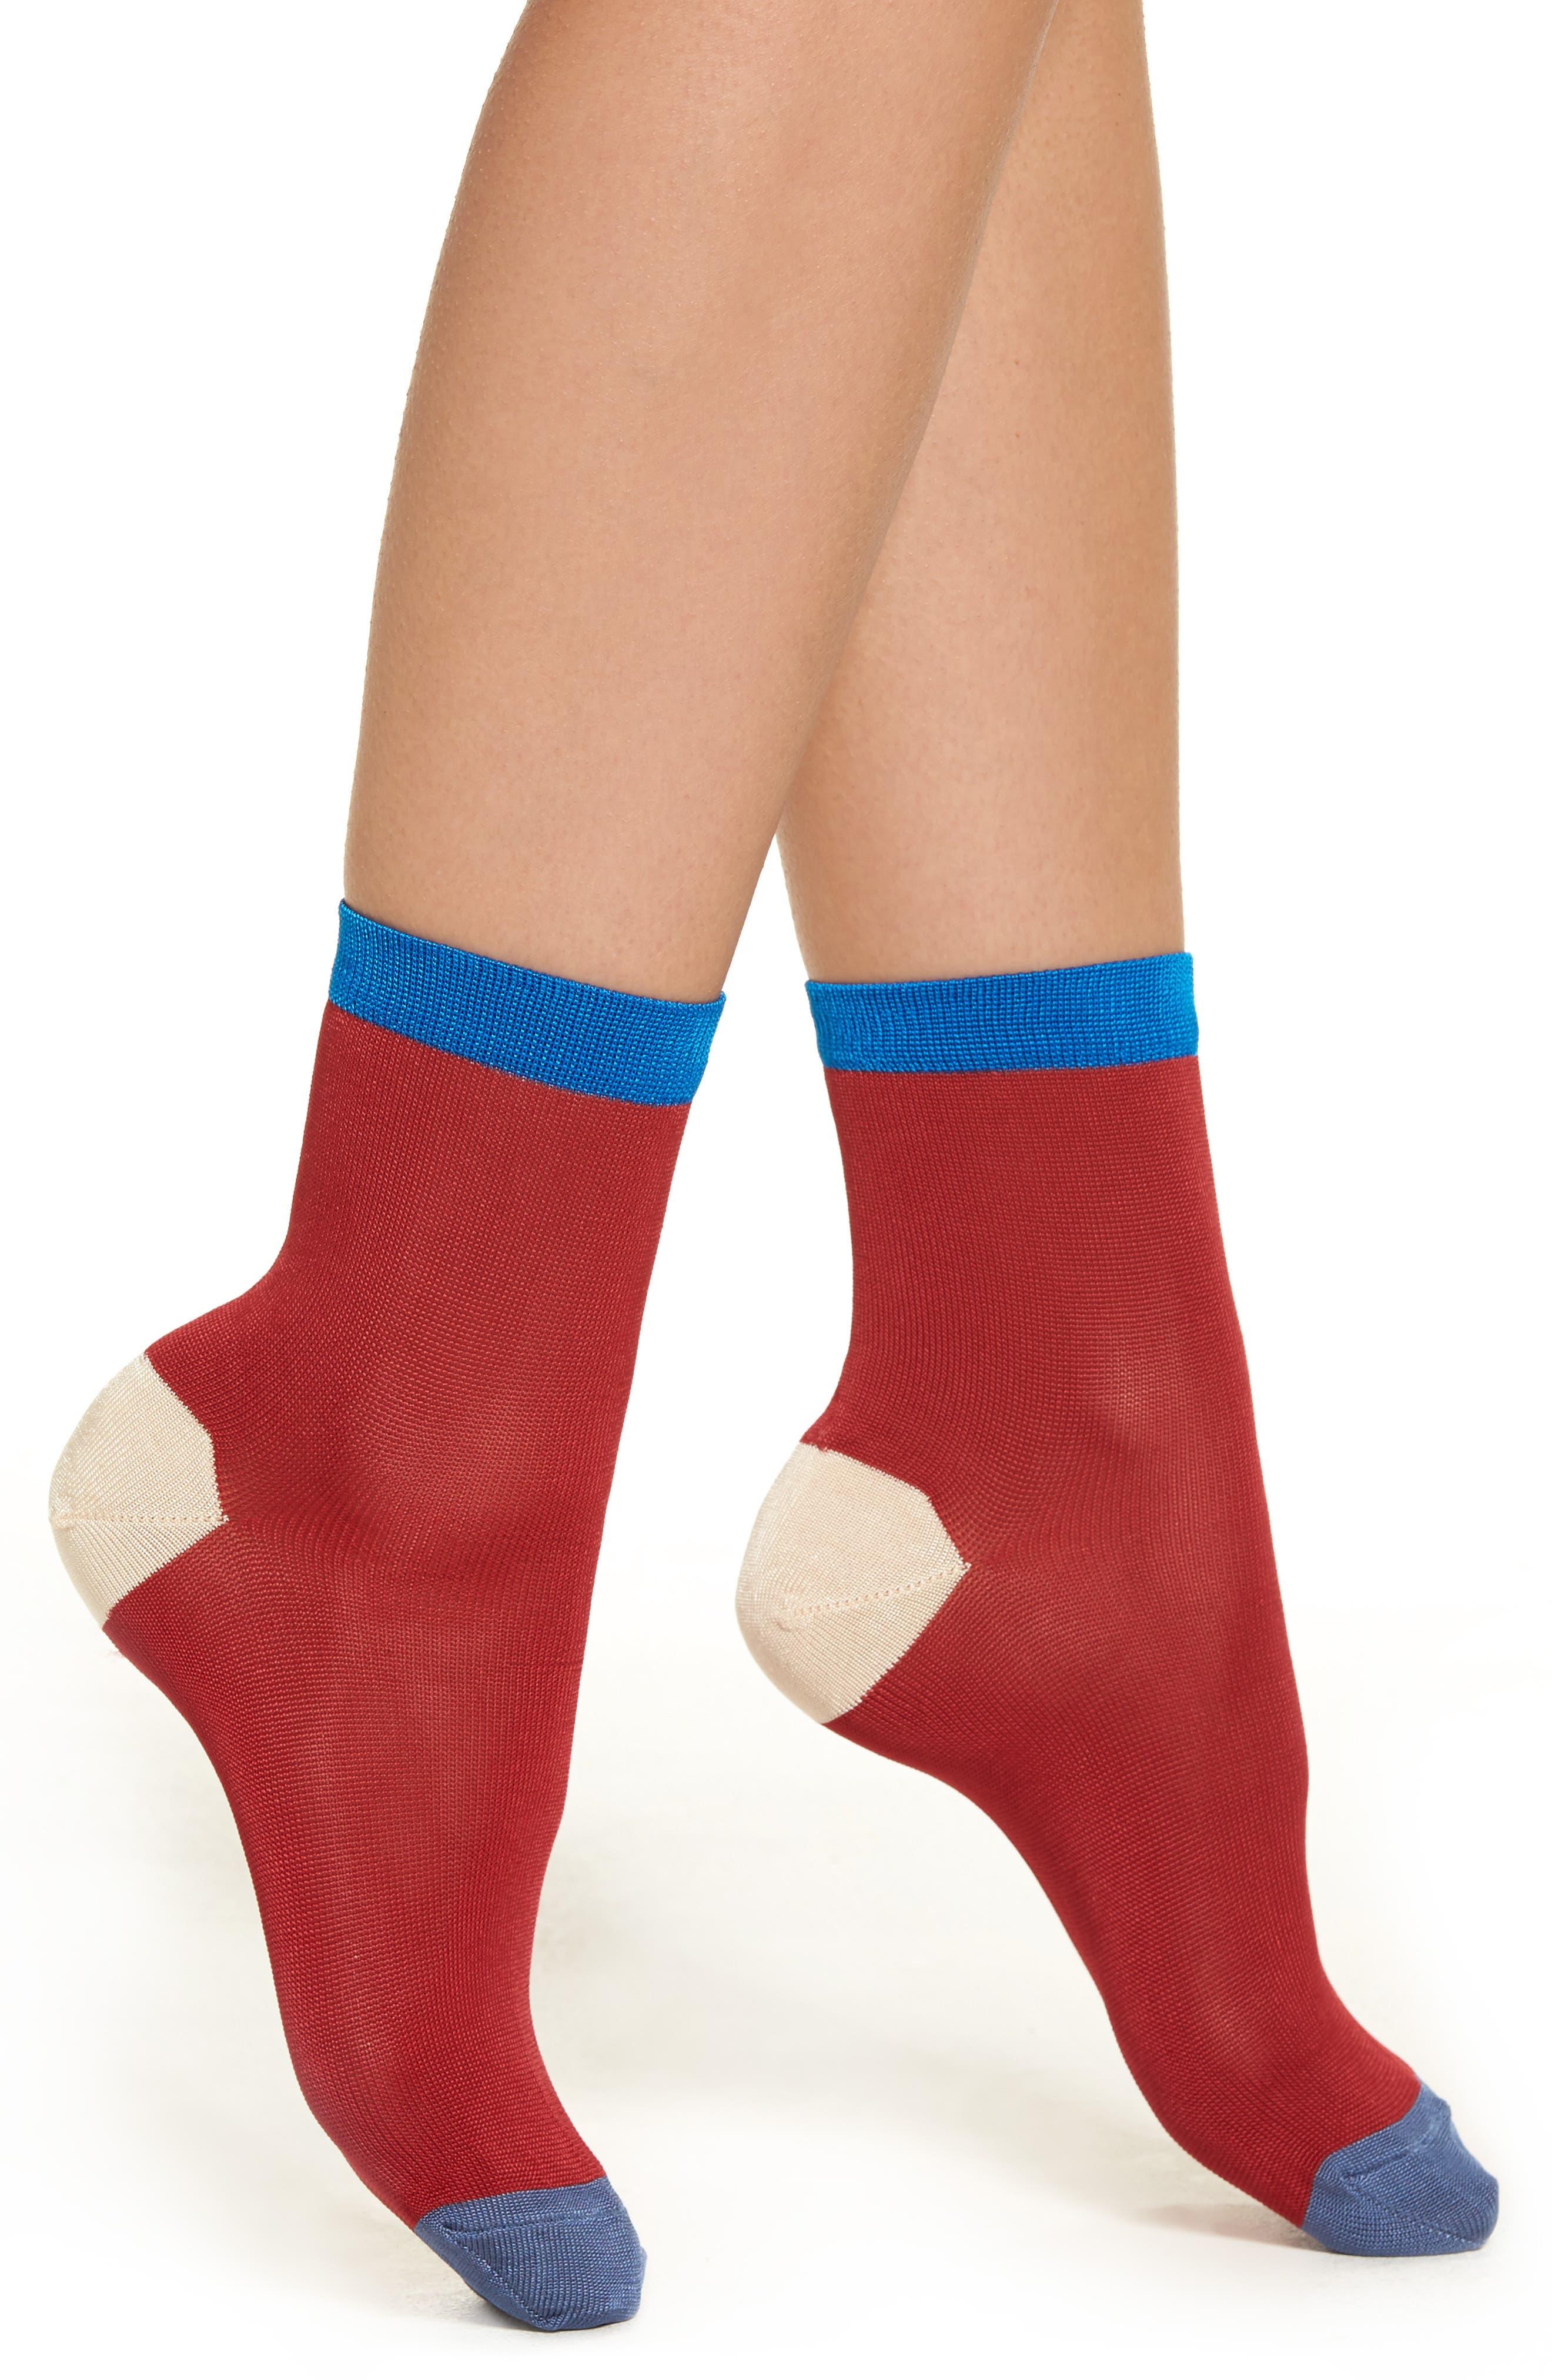 Grace Colorblock Ankle Socks,                             Main thumbnail 1, color,                             600